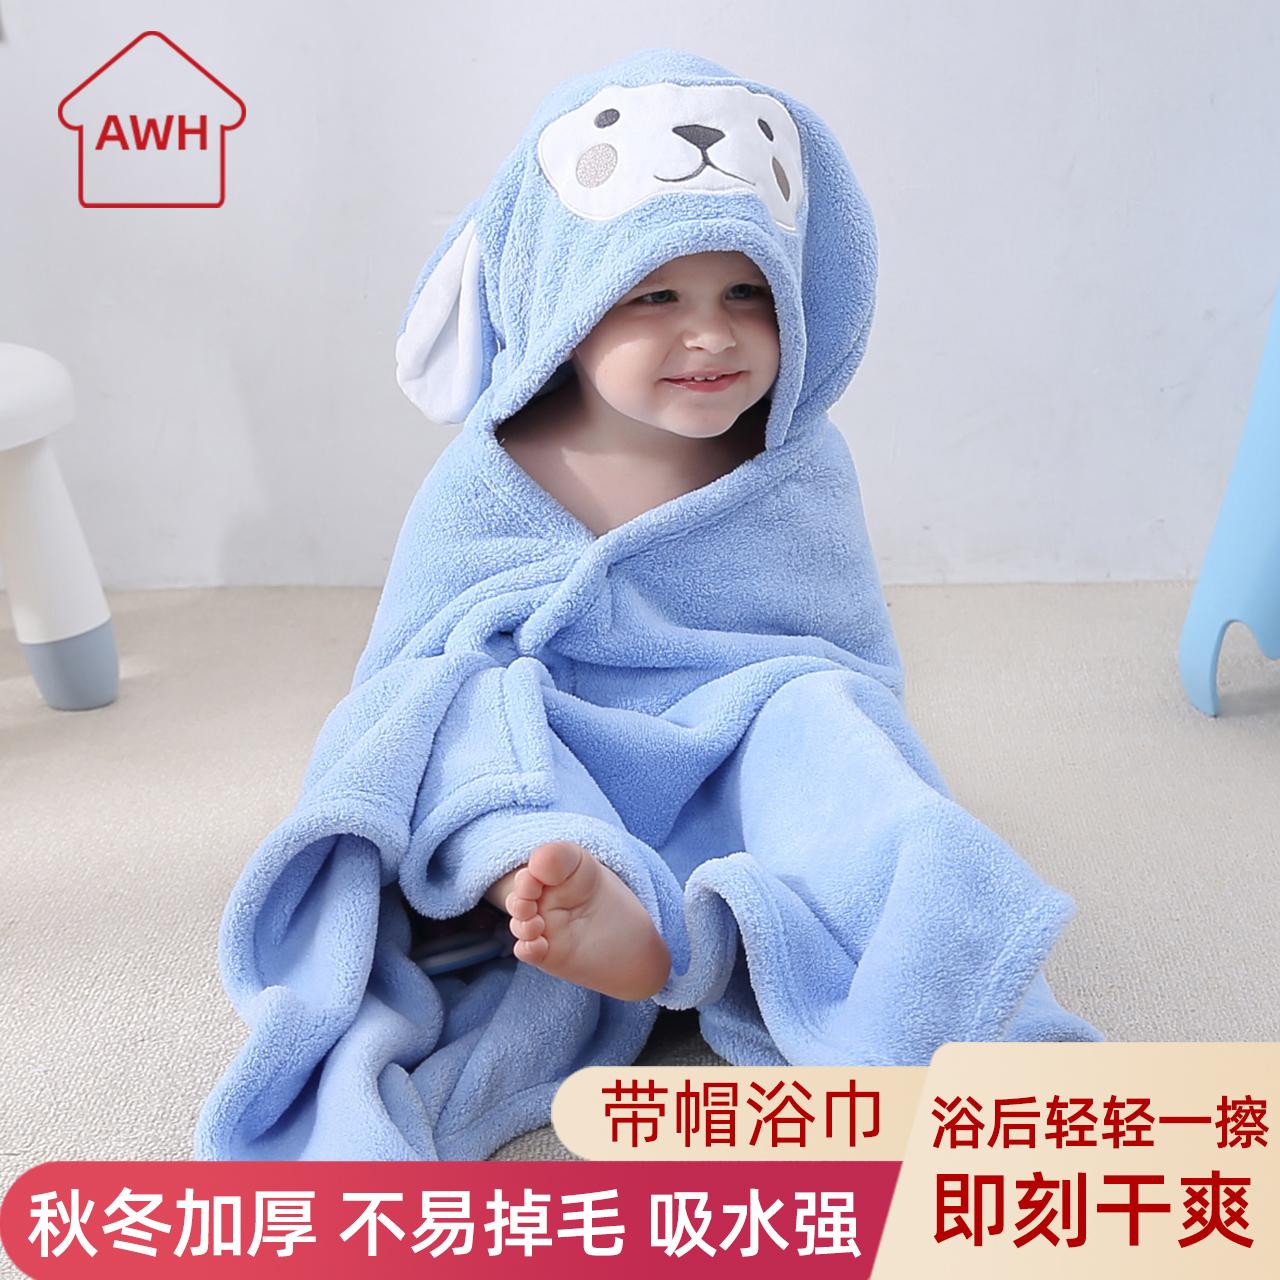 AWH 儿童 浴巾斗篷带帽 19.9元包邮